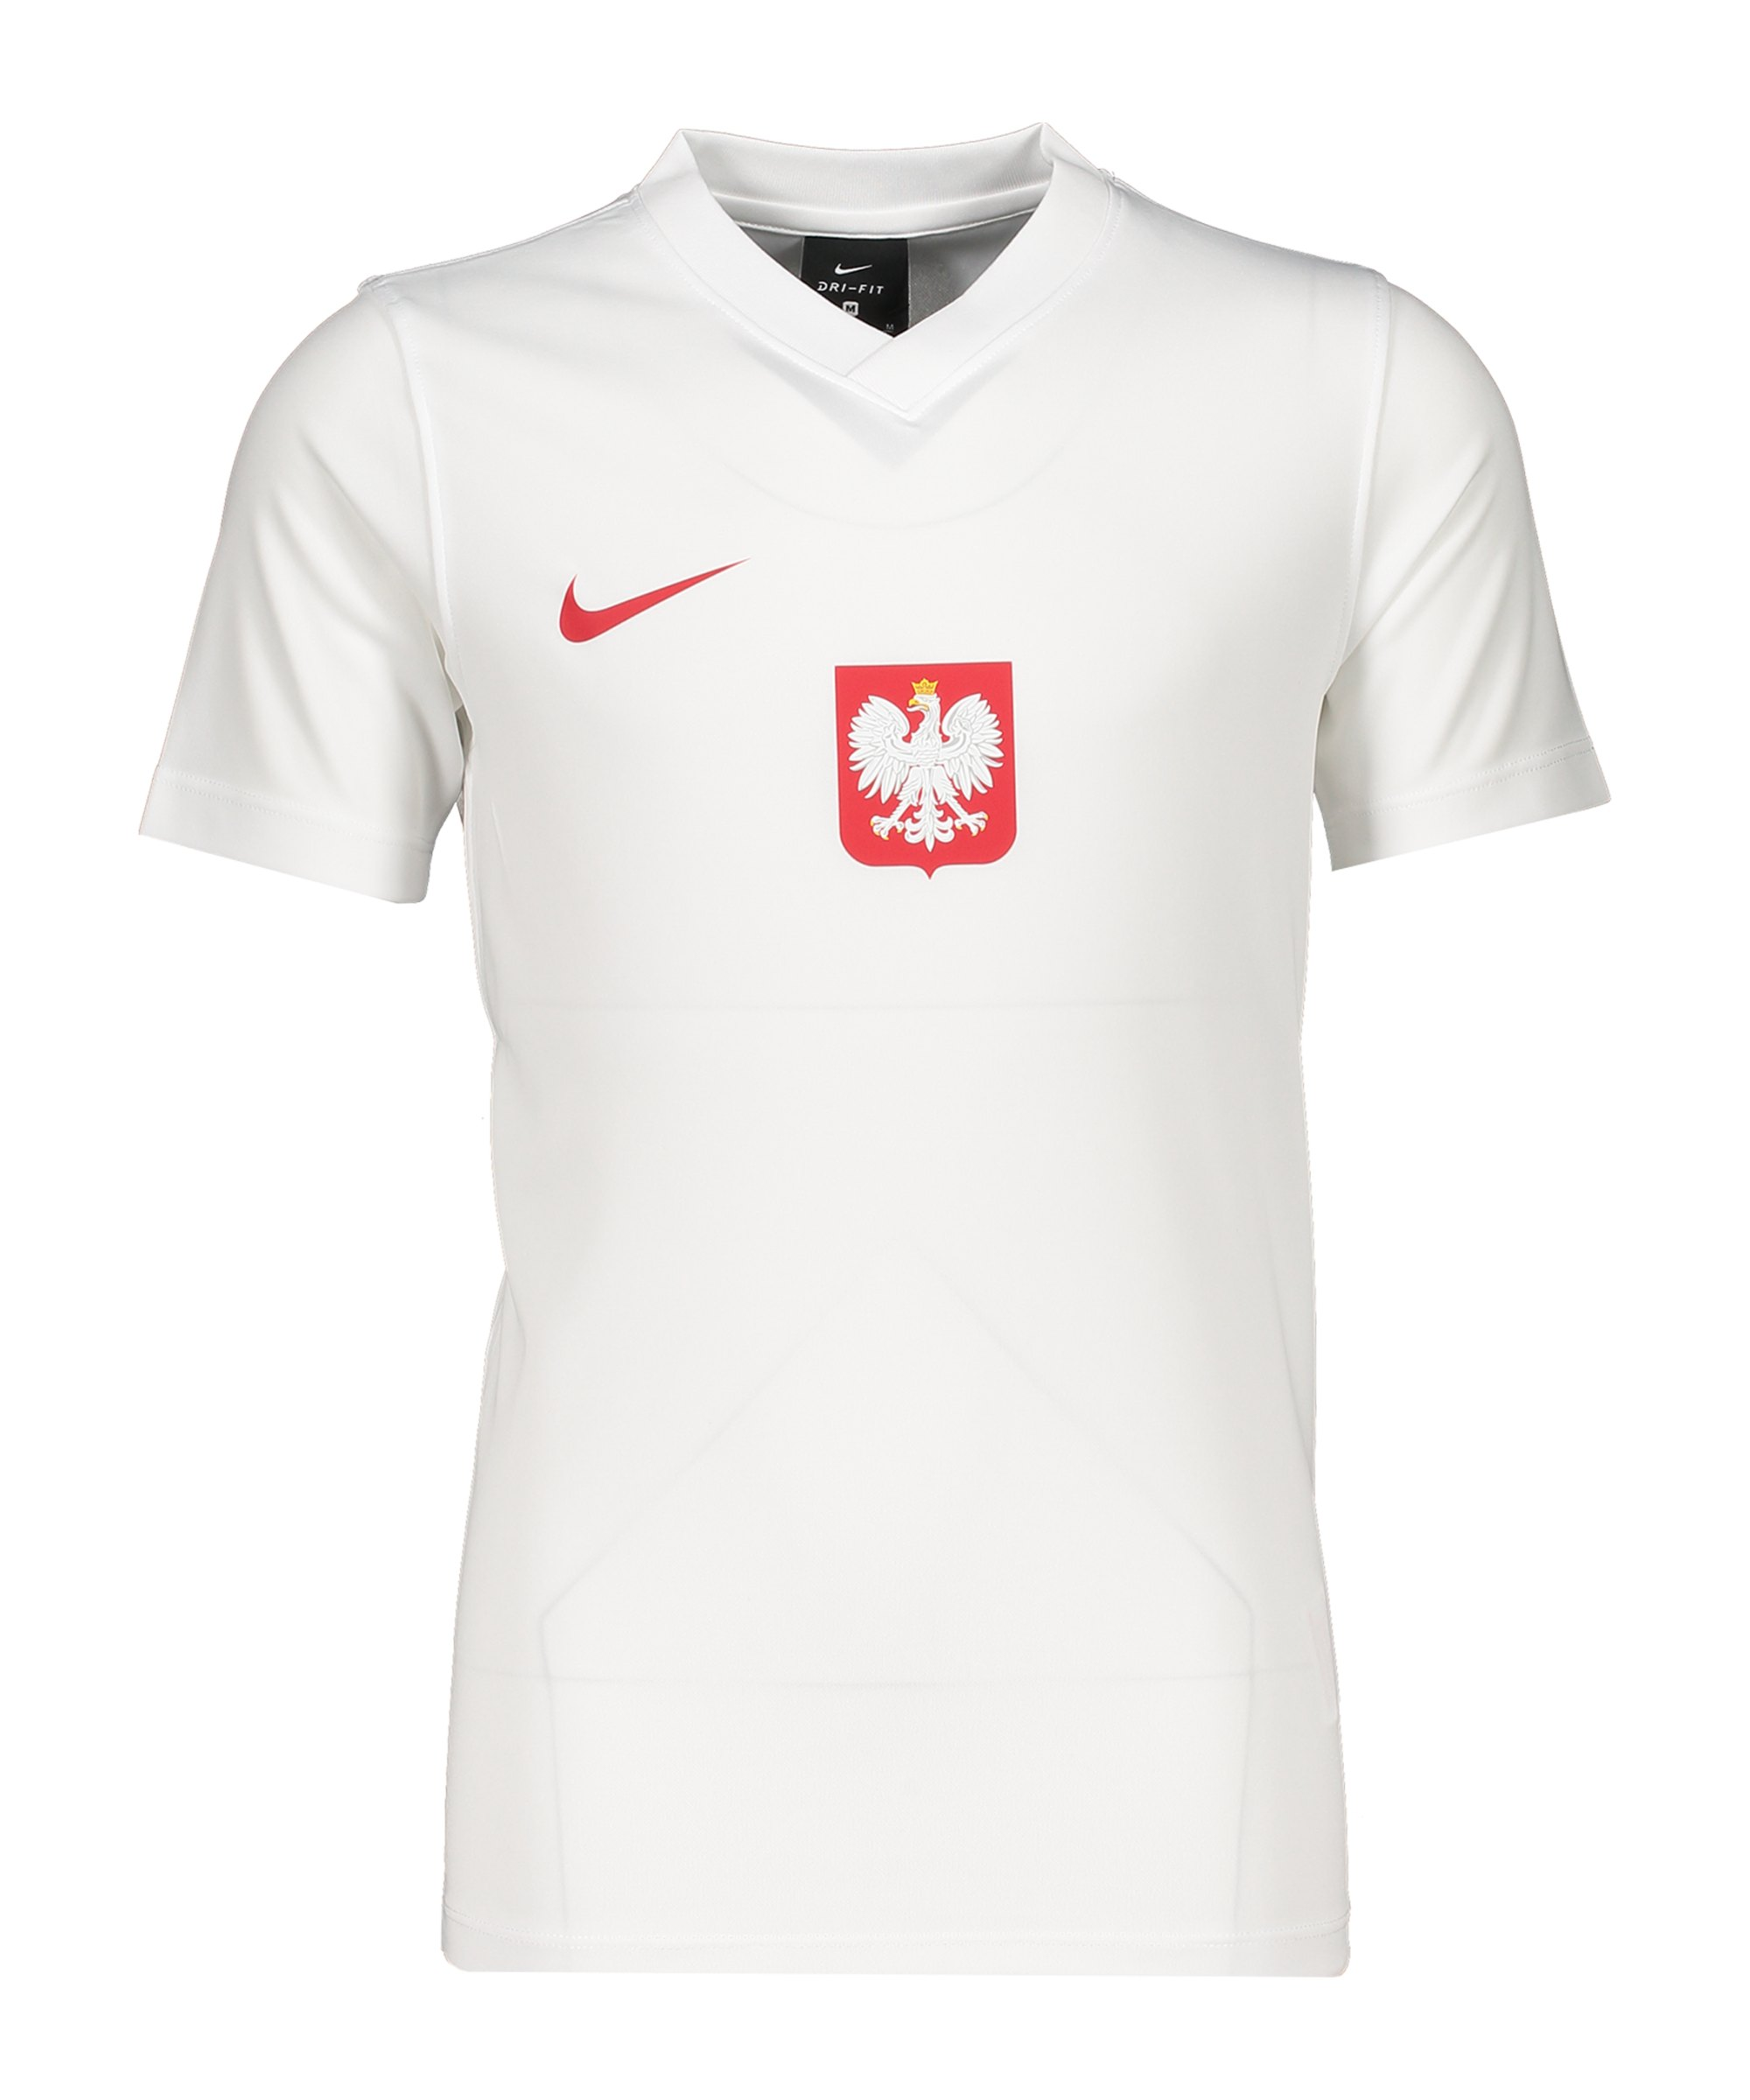 Nike Polen Trainingstop kurzarm Kids Weiss F100 - weiss